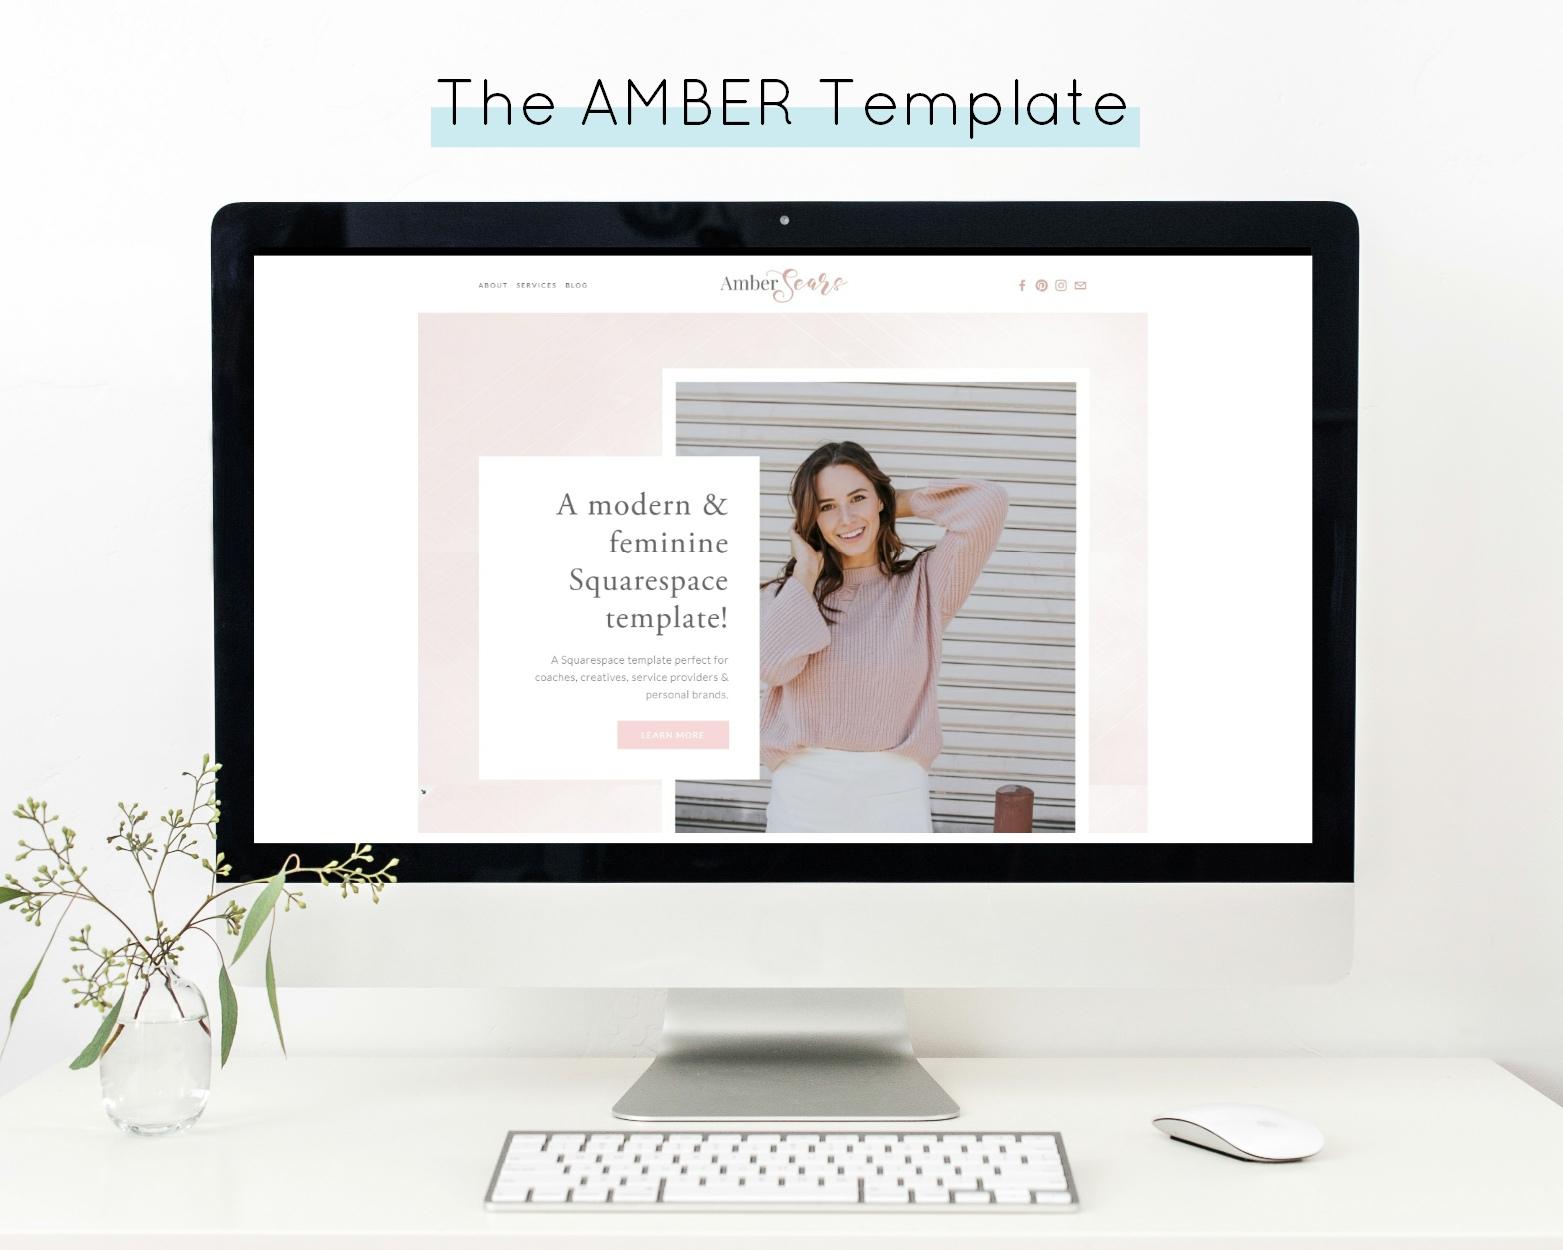 Template_Amber.jpg